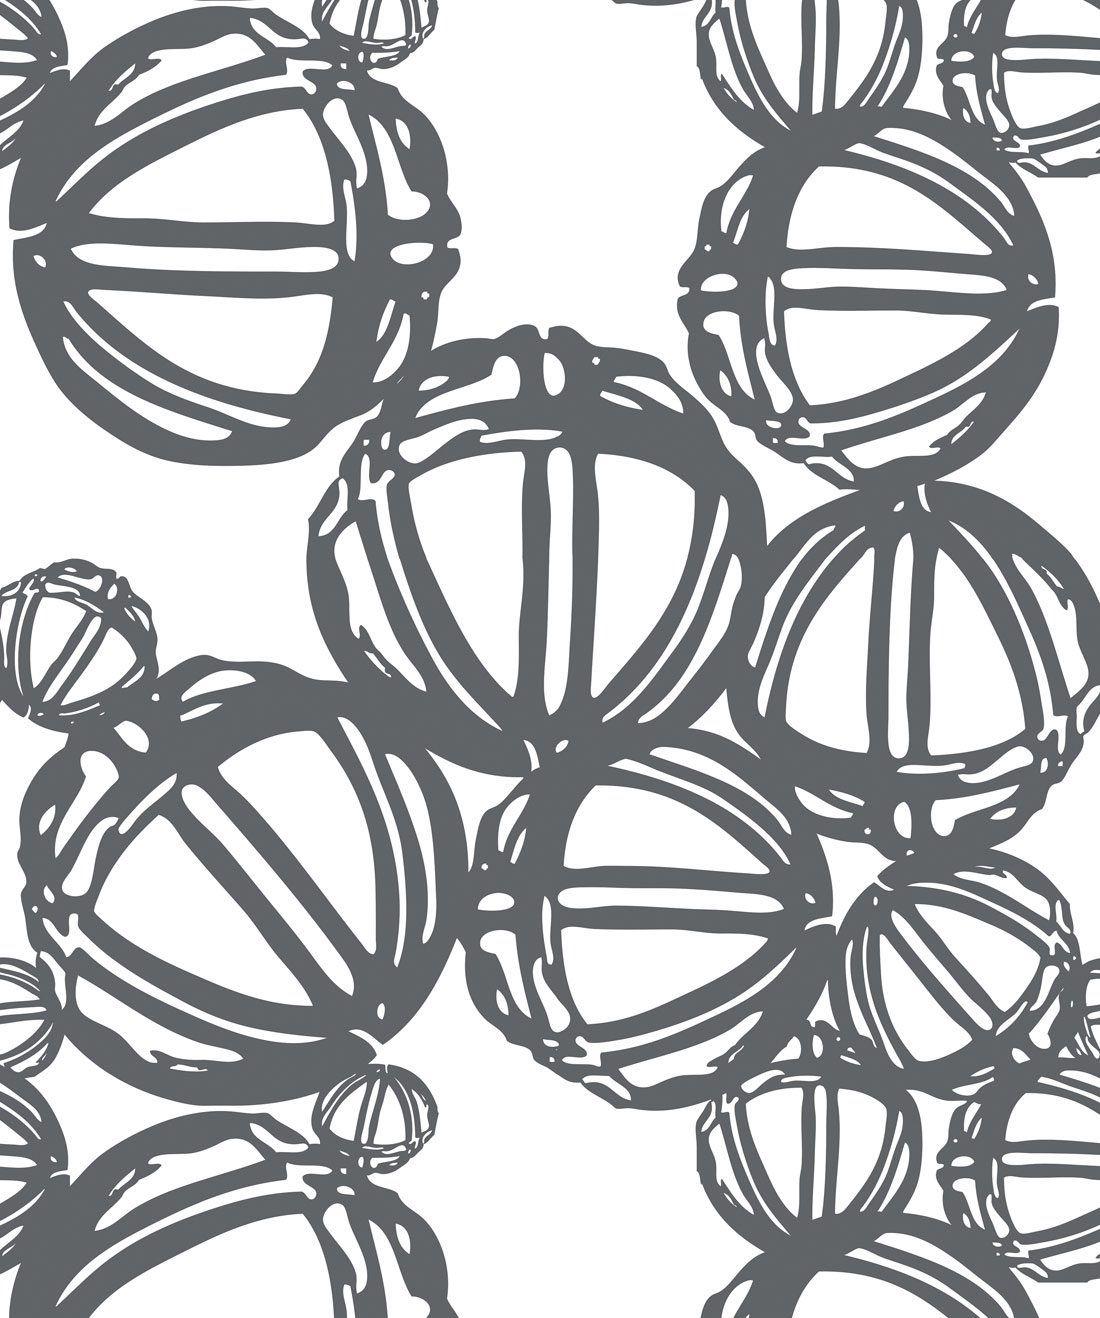 Skittles Charcoal Wallpaper